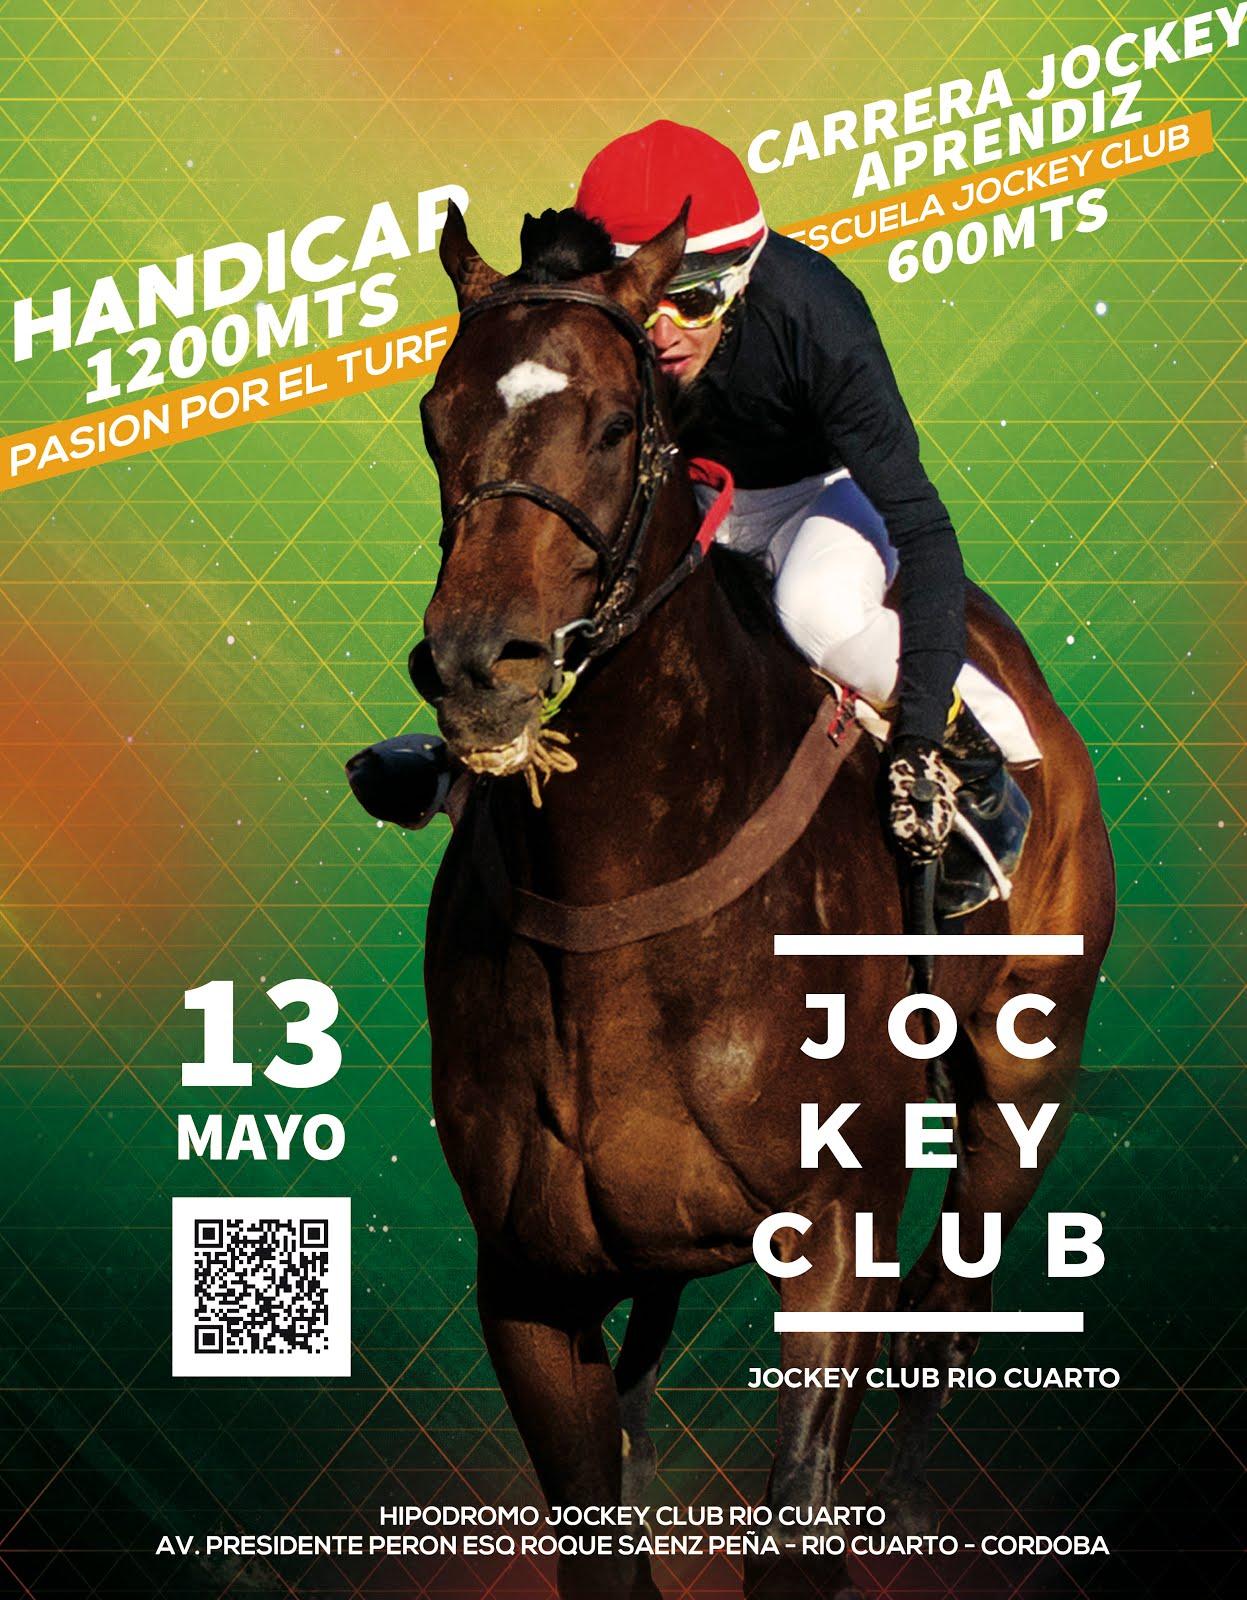 Programa De Carrera 13 De Mayo Hipodromo Jockey Club Rio Cuarto